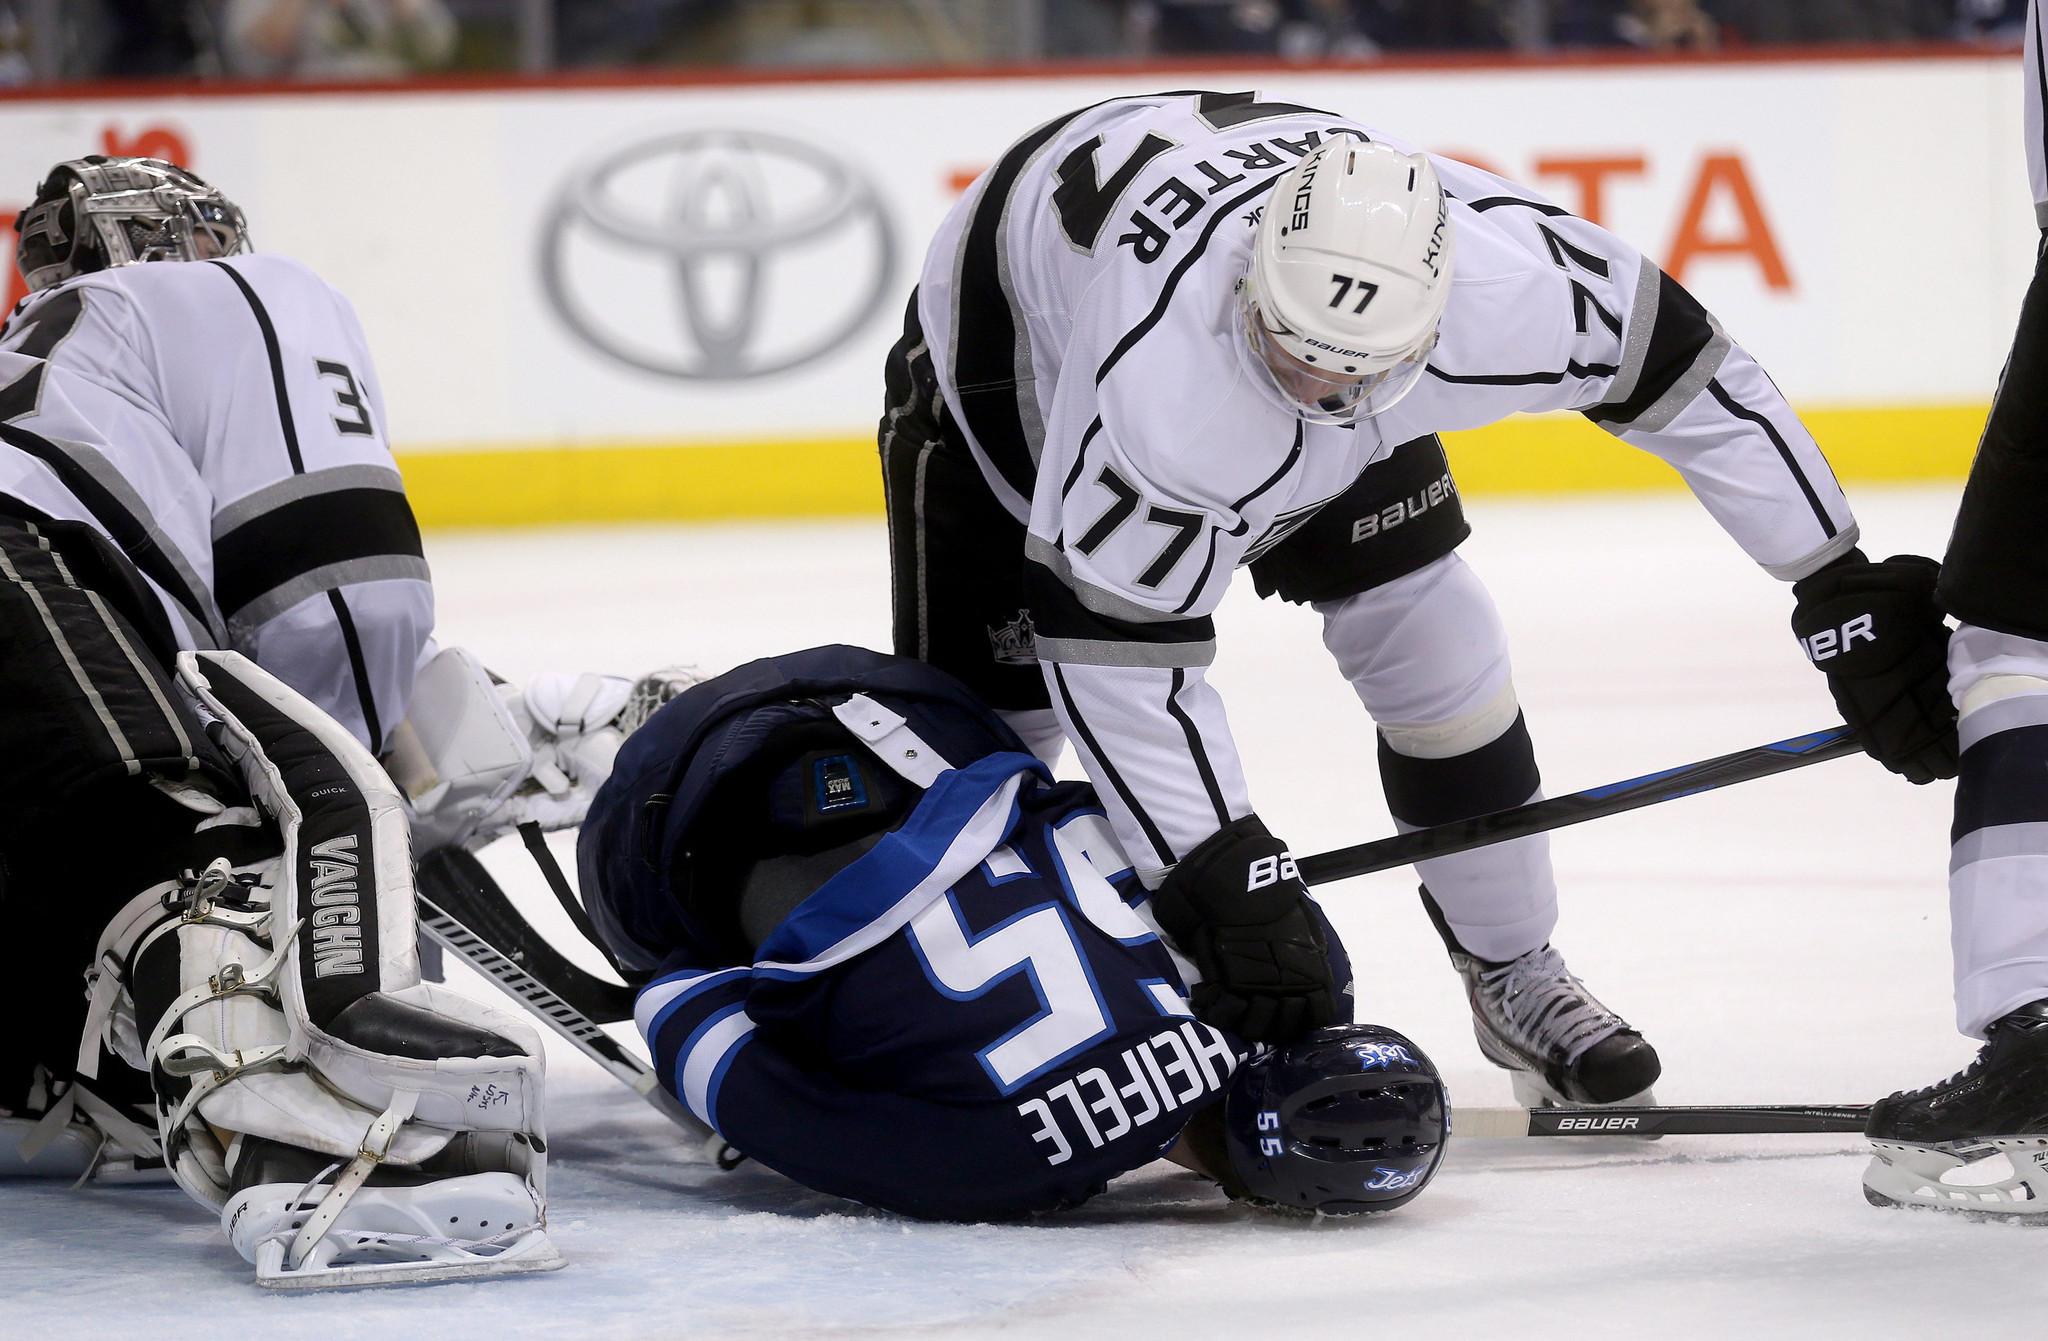 Kings Lose Third Consecutive Game, 5-2 To Winnipeg